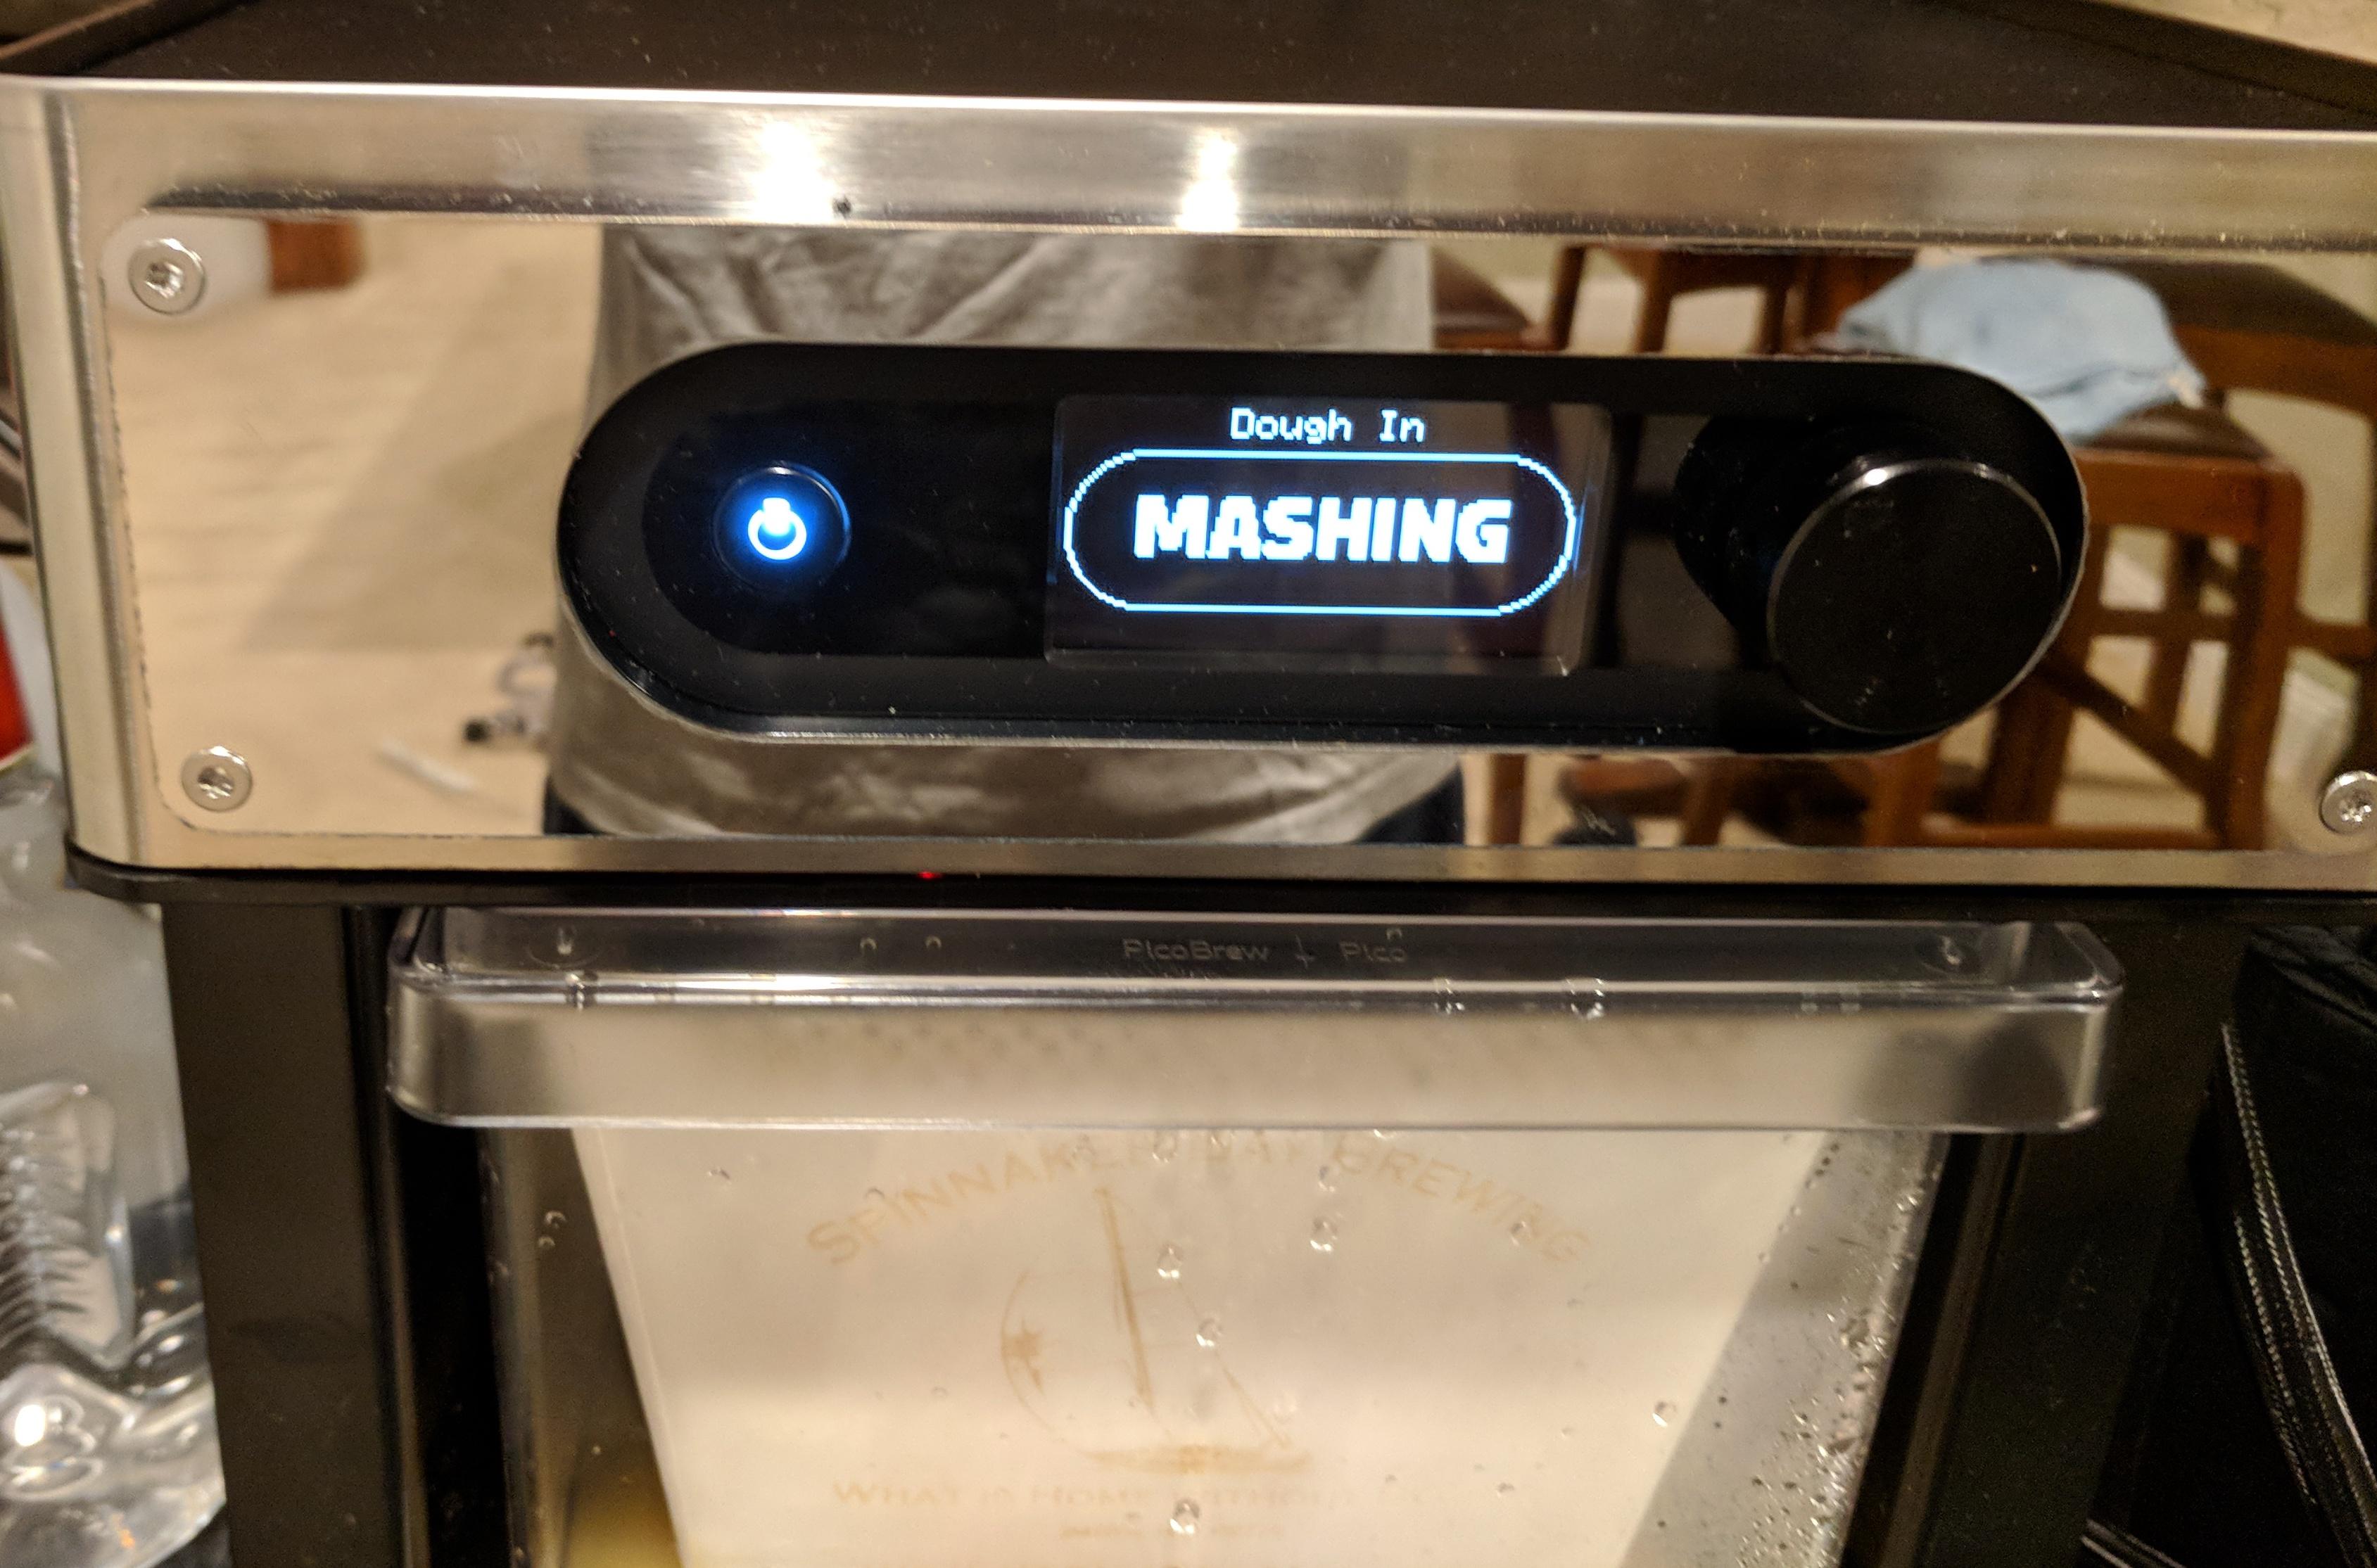 Nintendo Kitchen Appliance